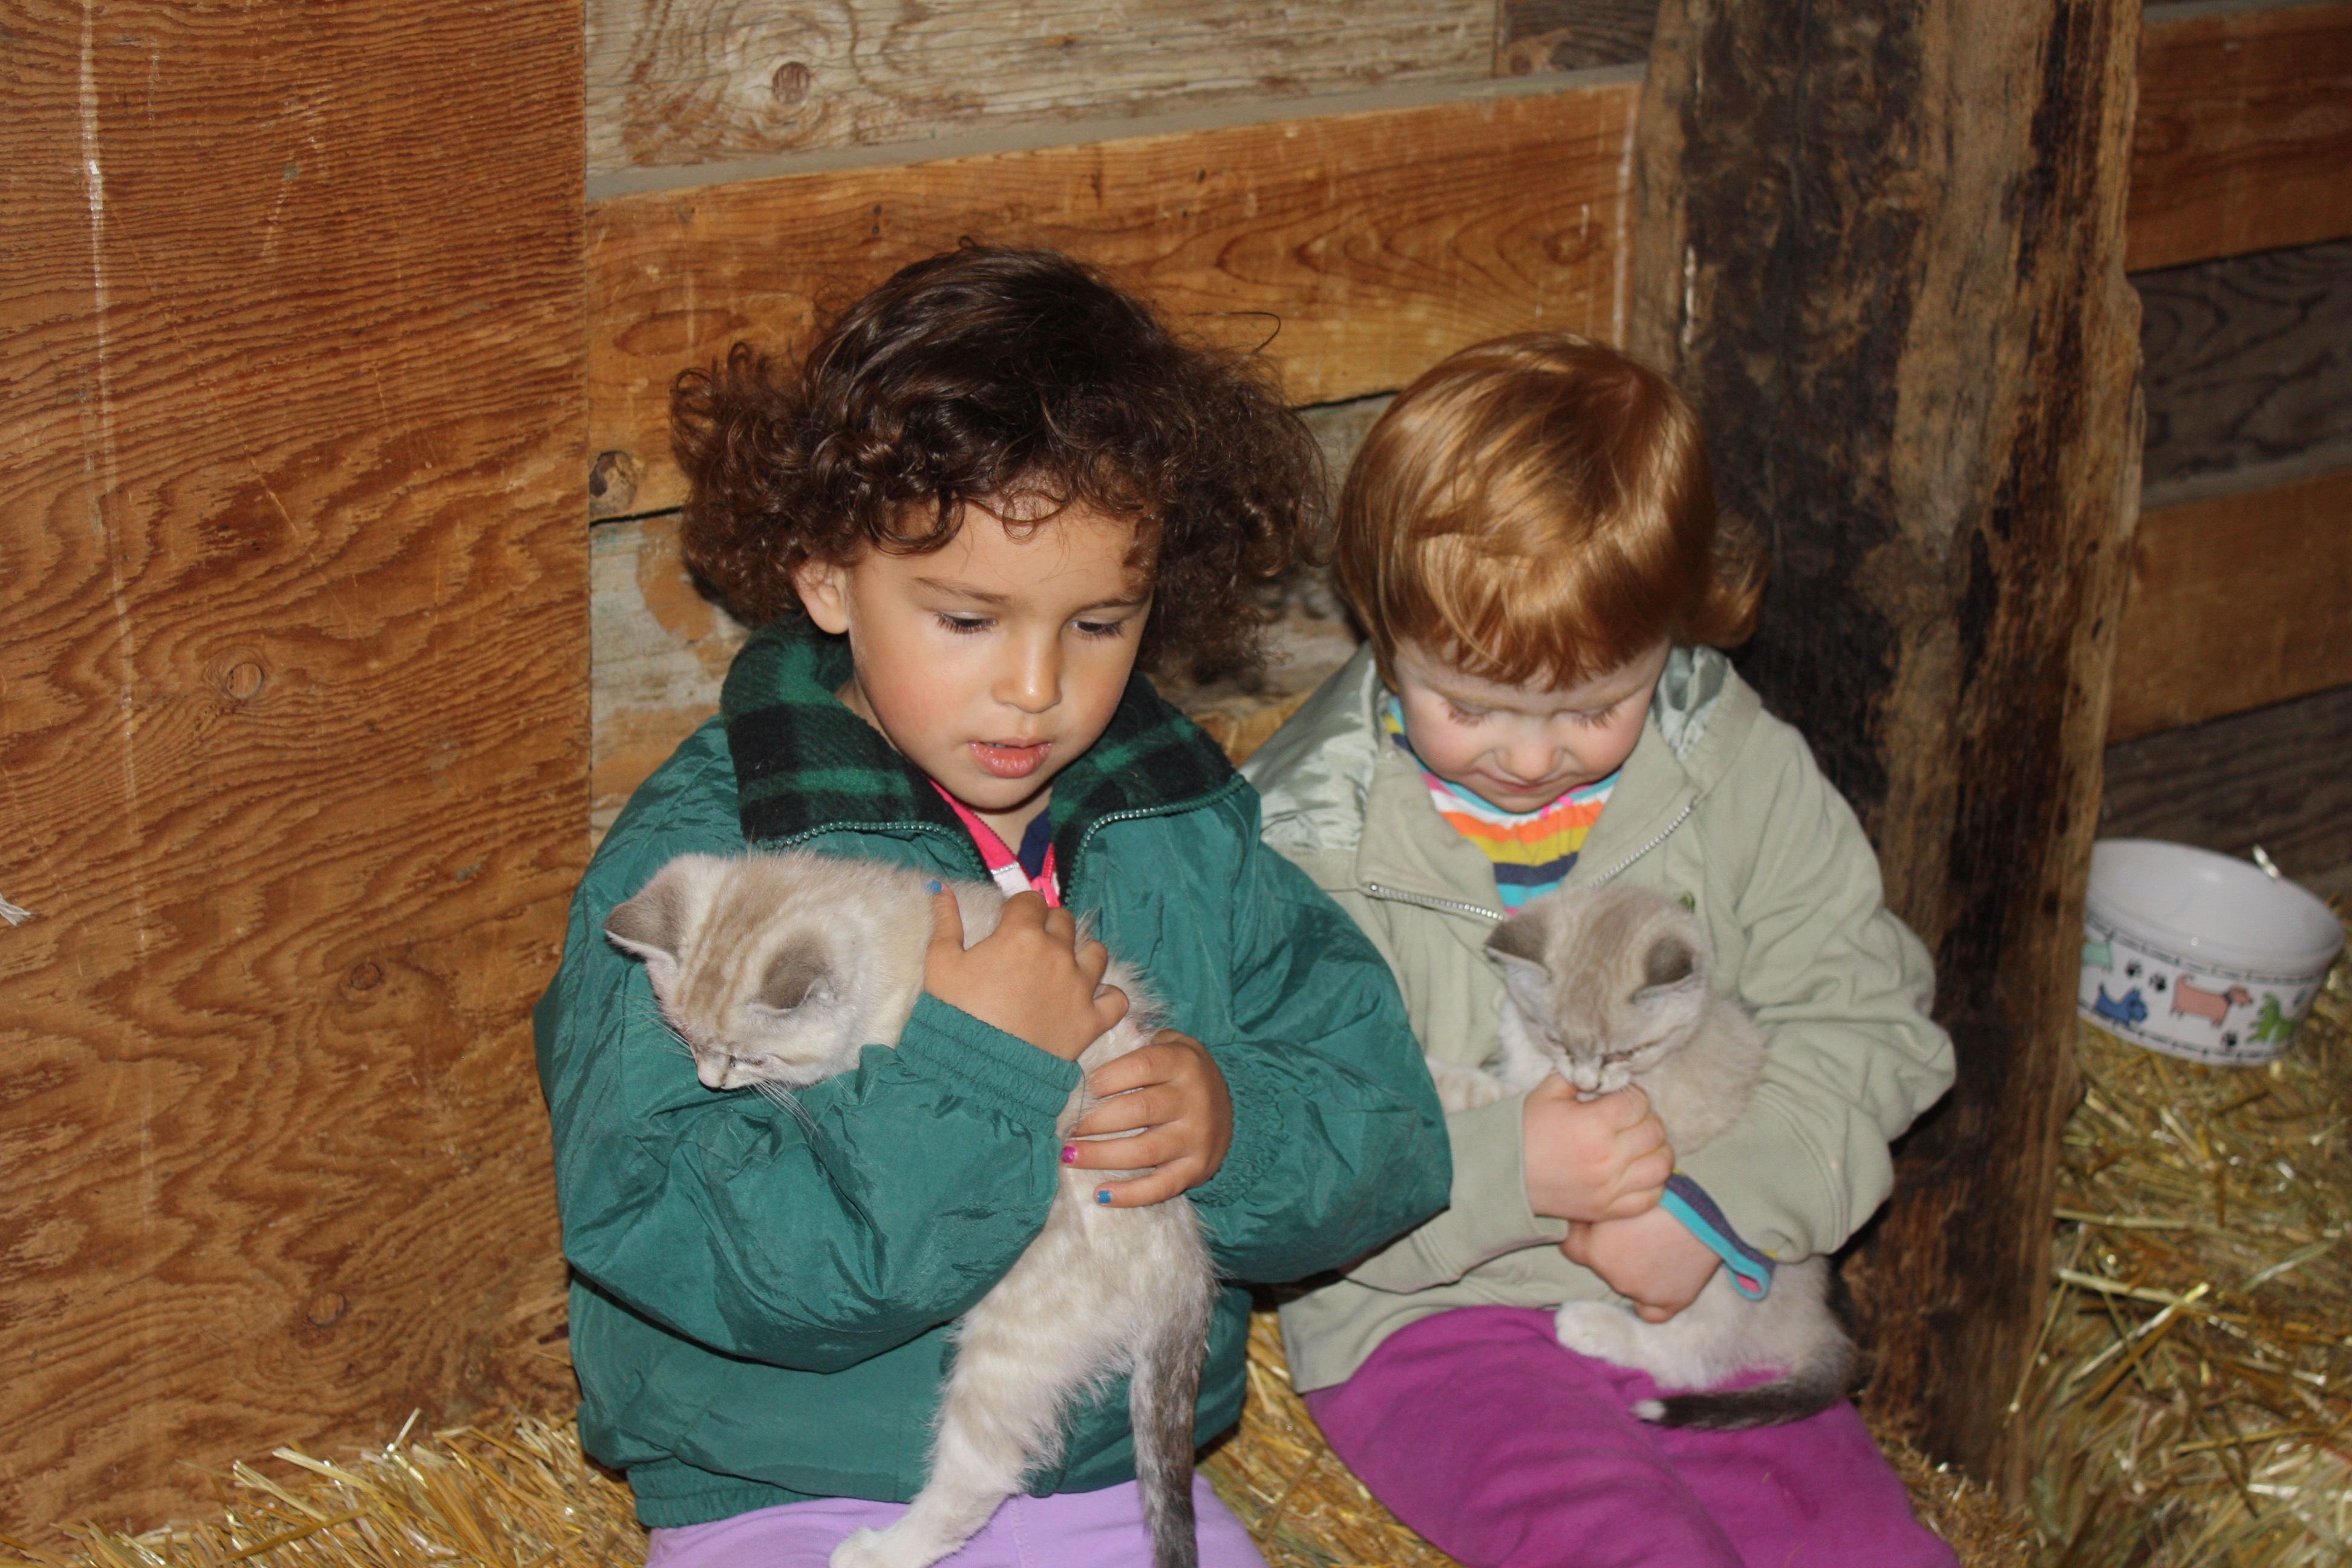 Sch visit kittens